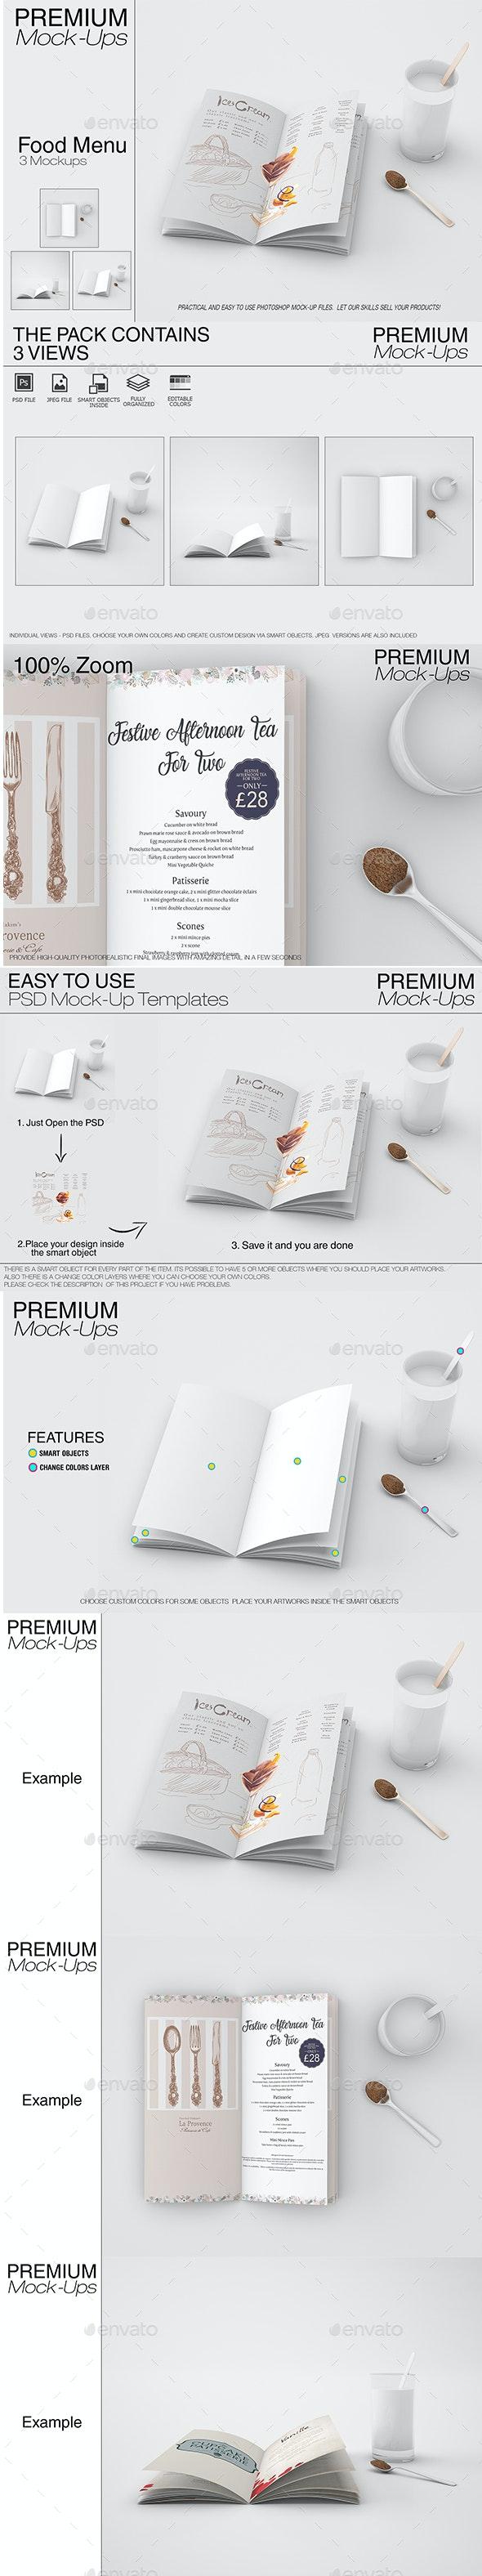 Food & Drink Menu Mockup Set - Print Product Mock-Ups